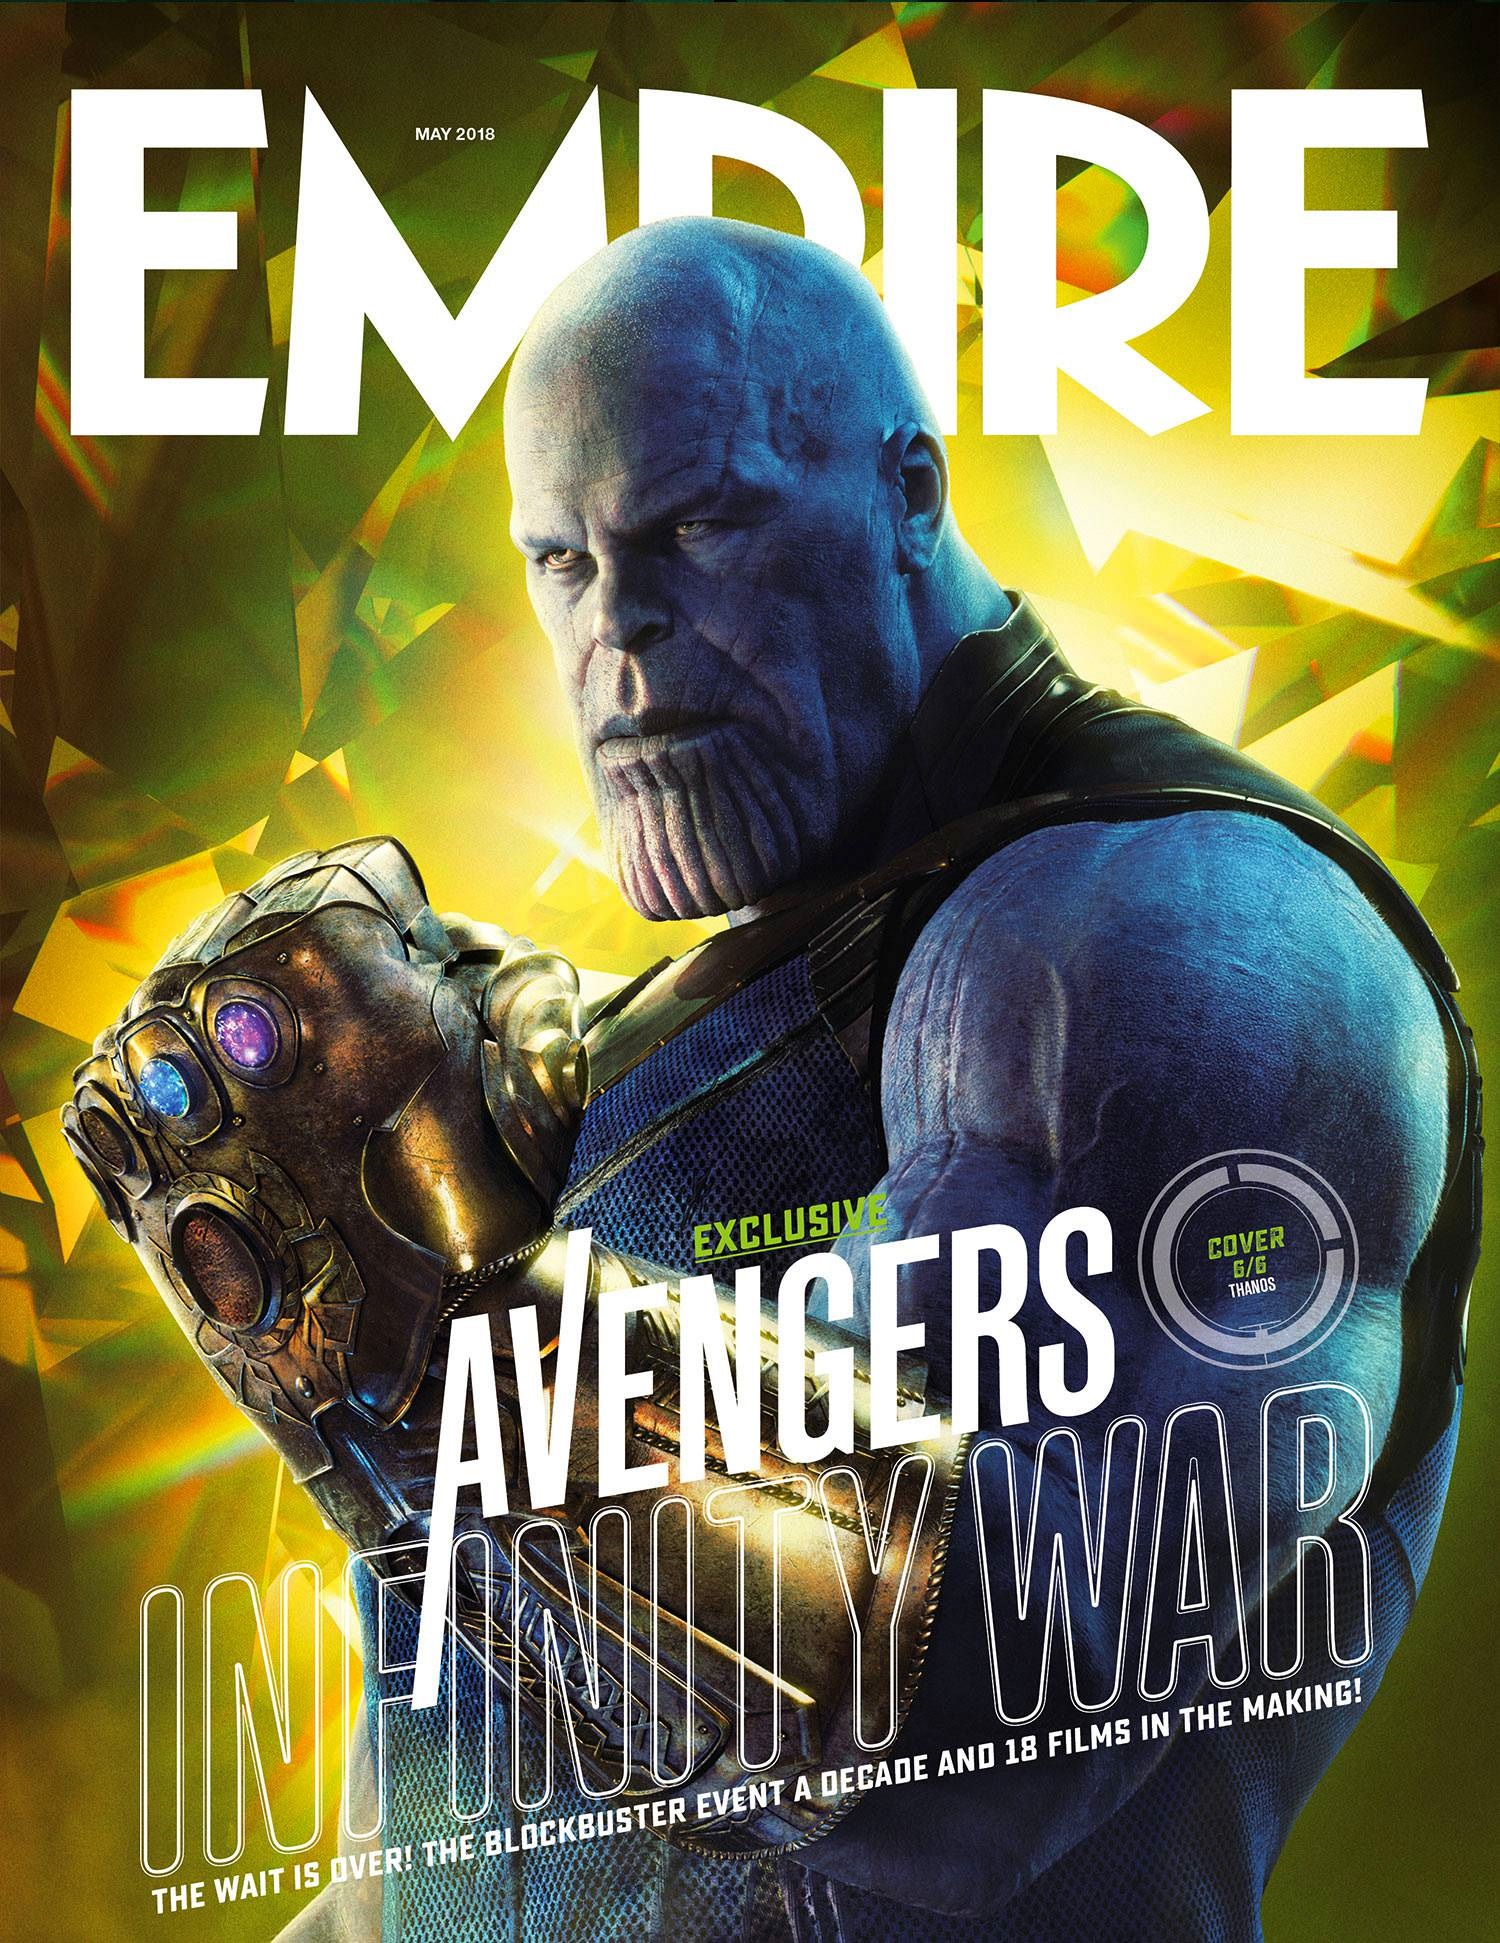 Empire cover featuring Thanos